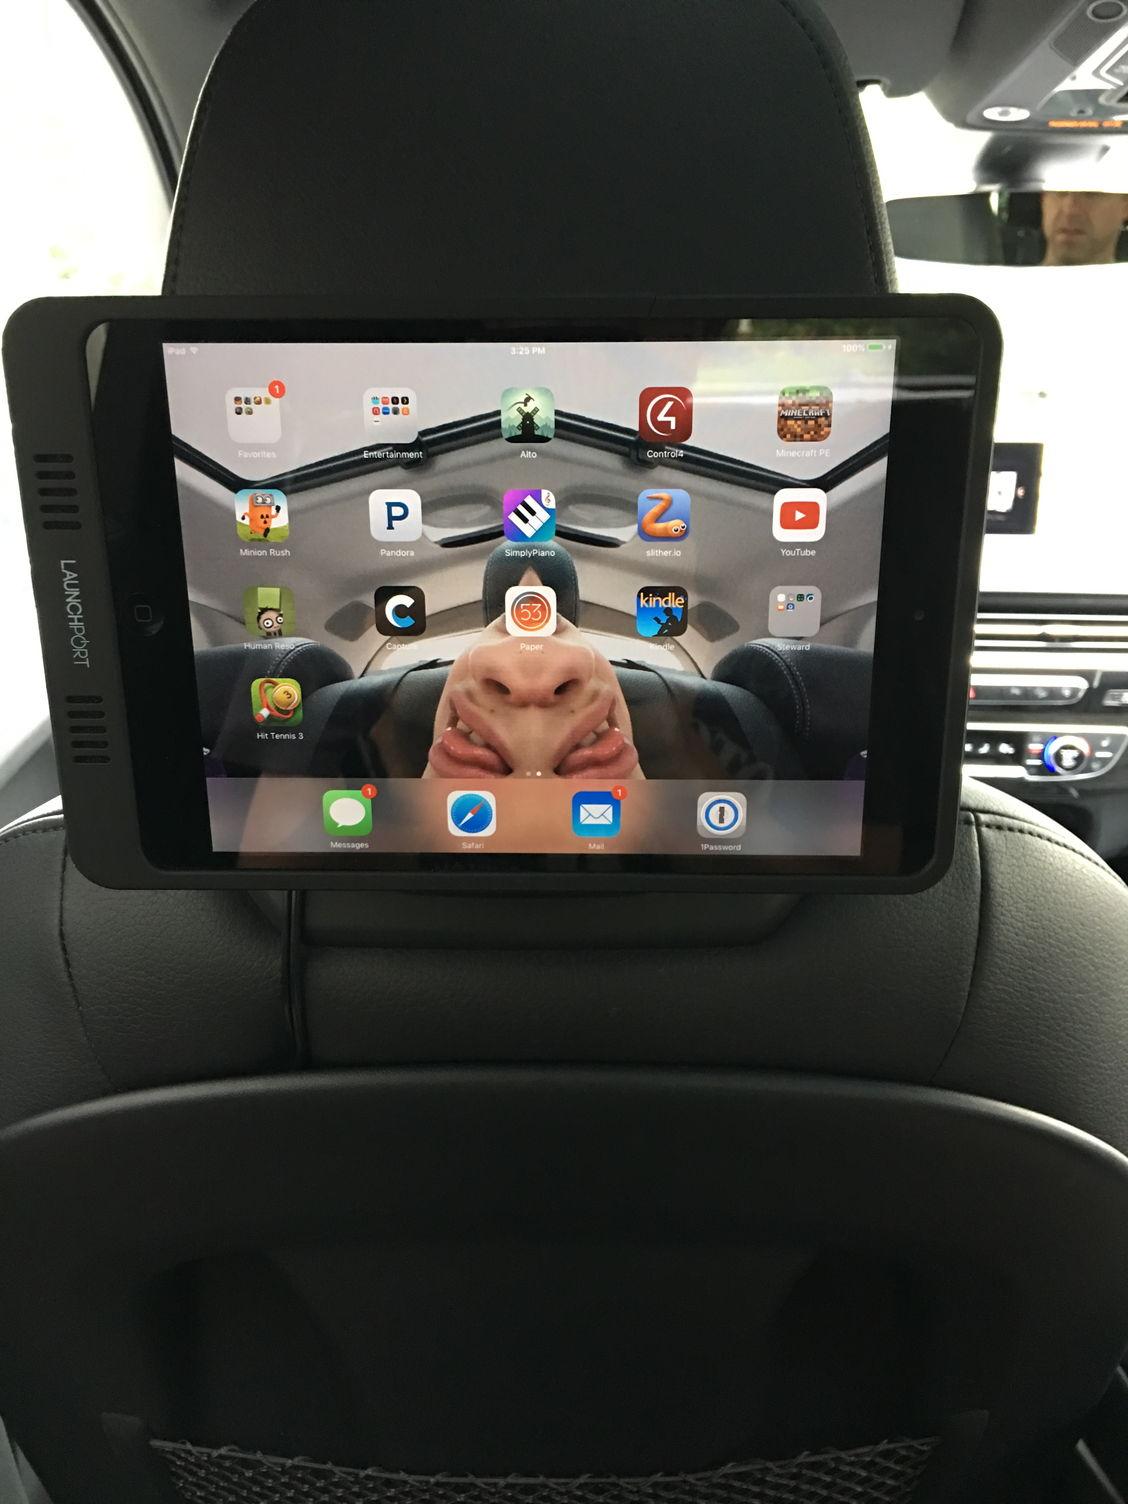 2017 q7 rse review horrible rear seat entertainment system page 15 audiworld forums. Black Bedroom Furniture Sets. Home Design Ideas